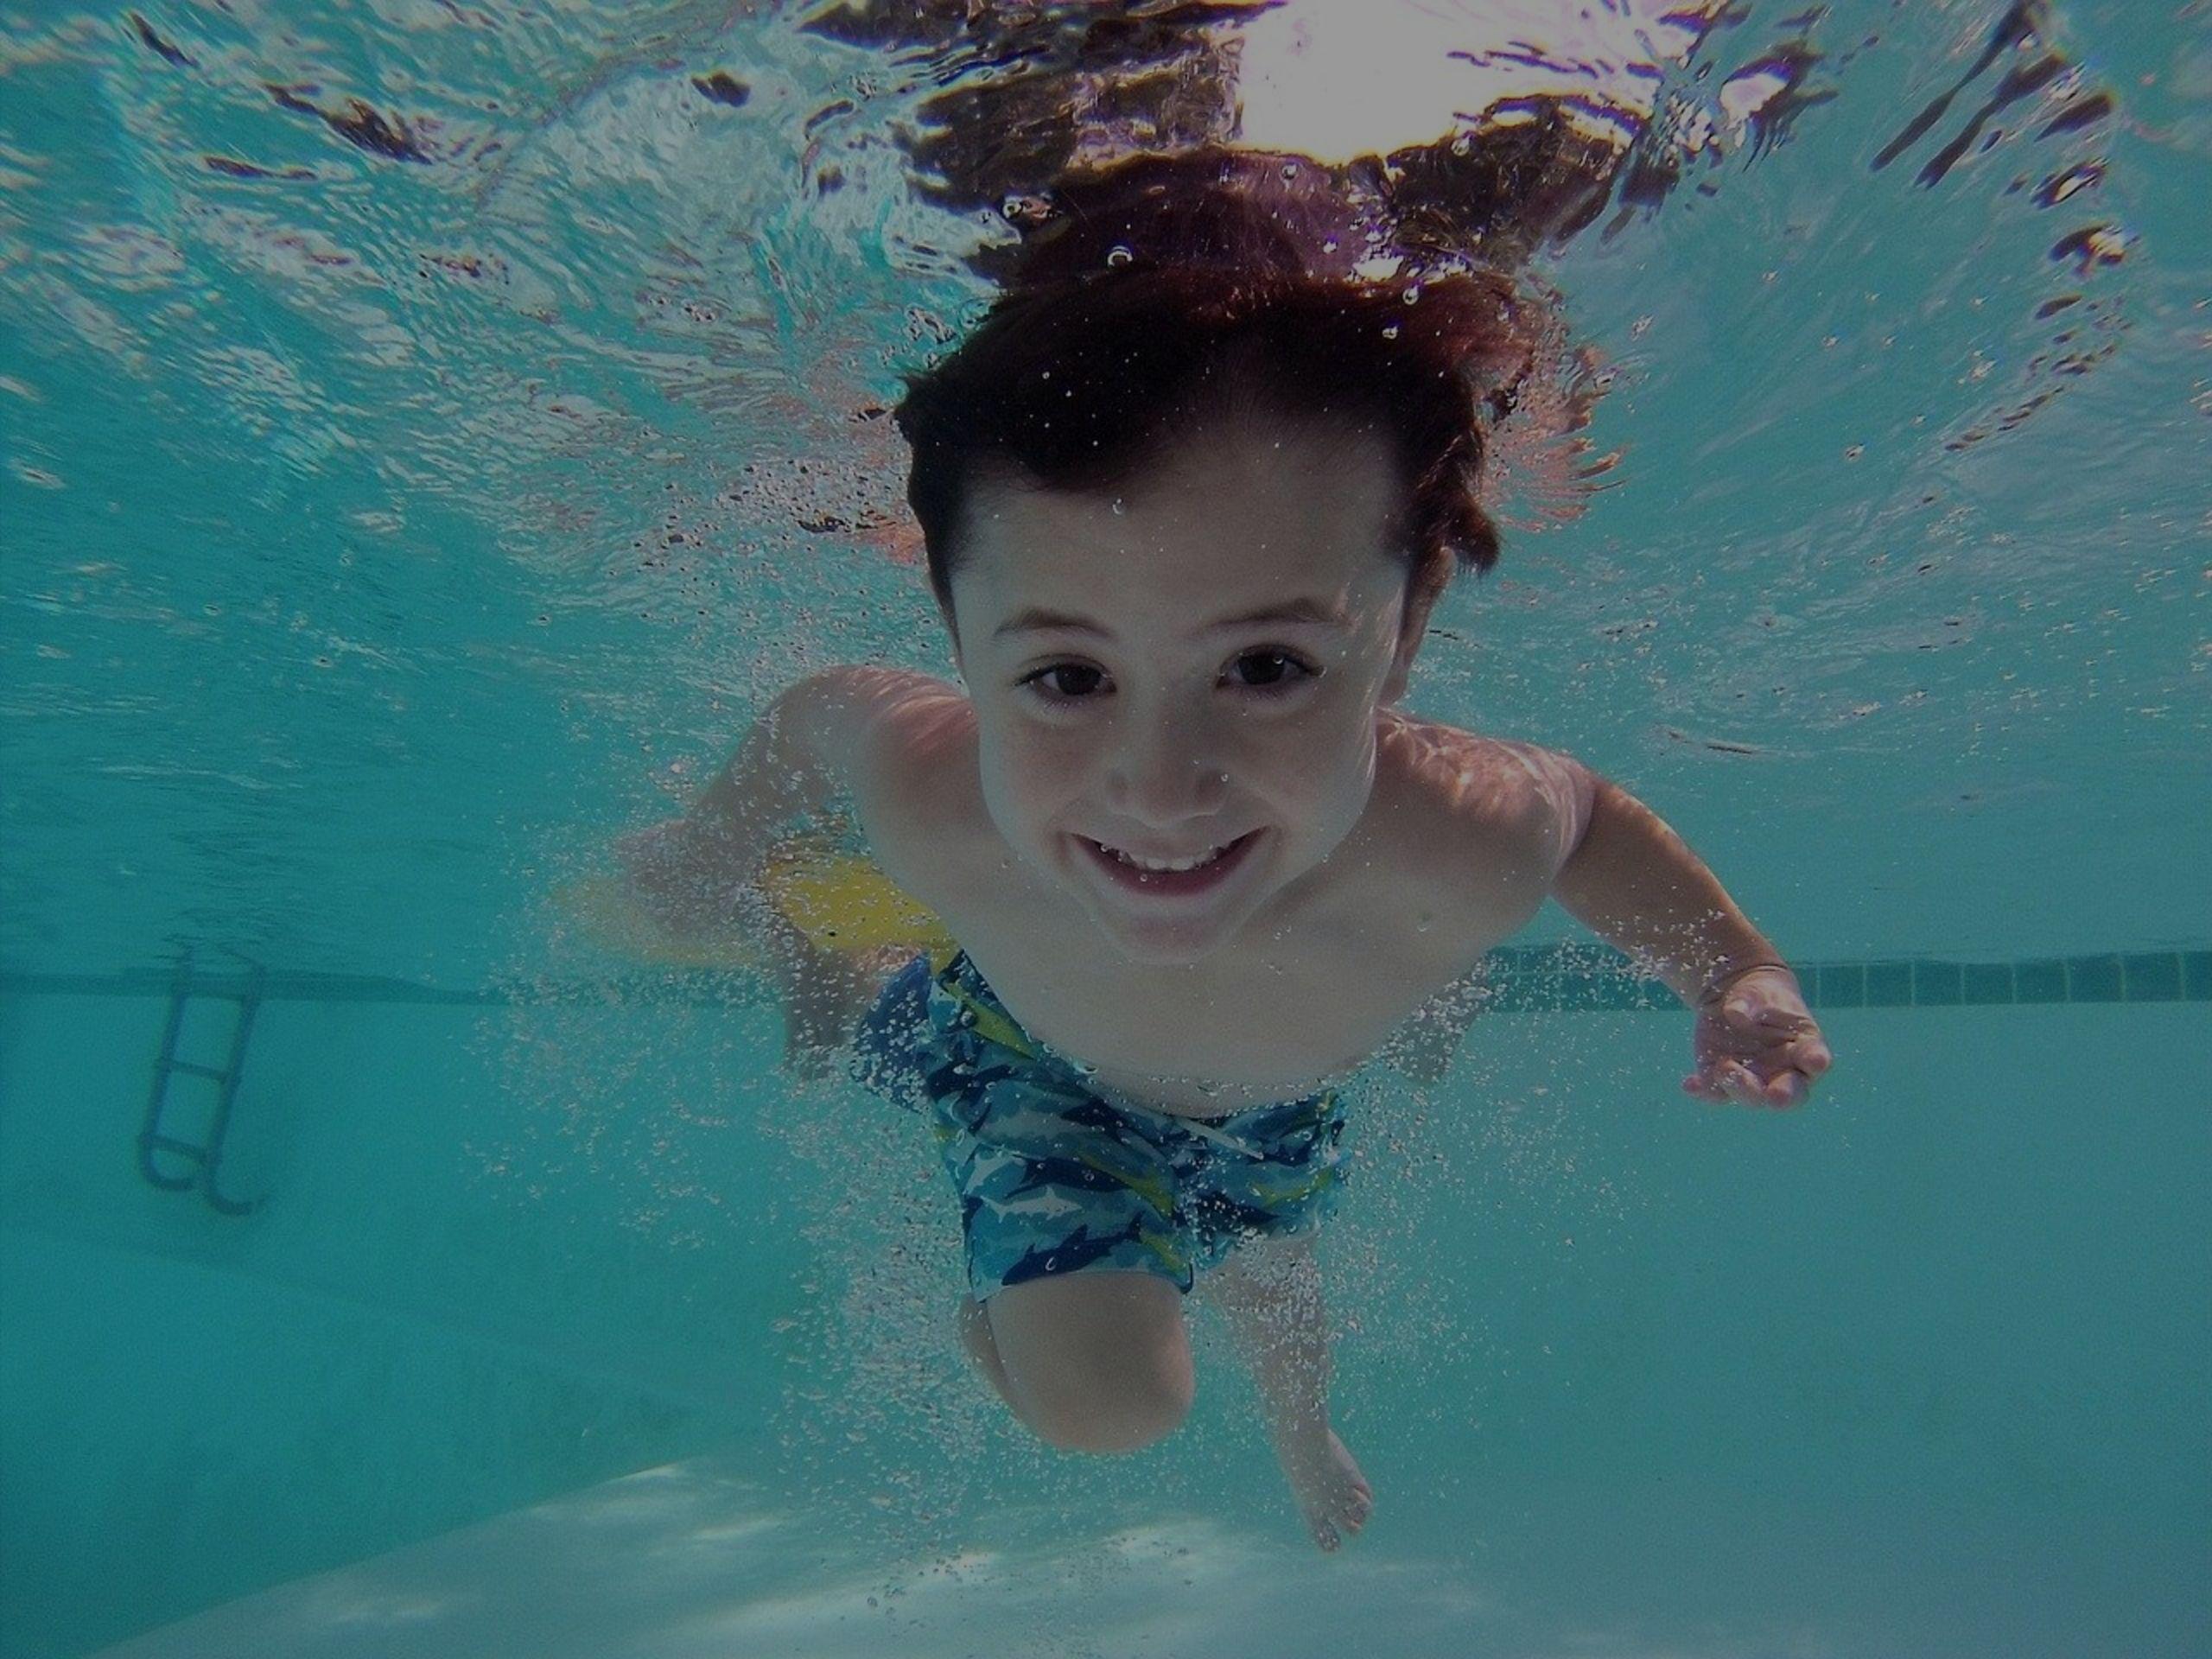 Can Your Pool Kill the Coronavirus?